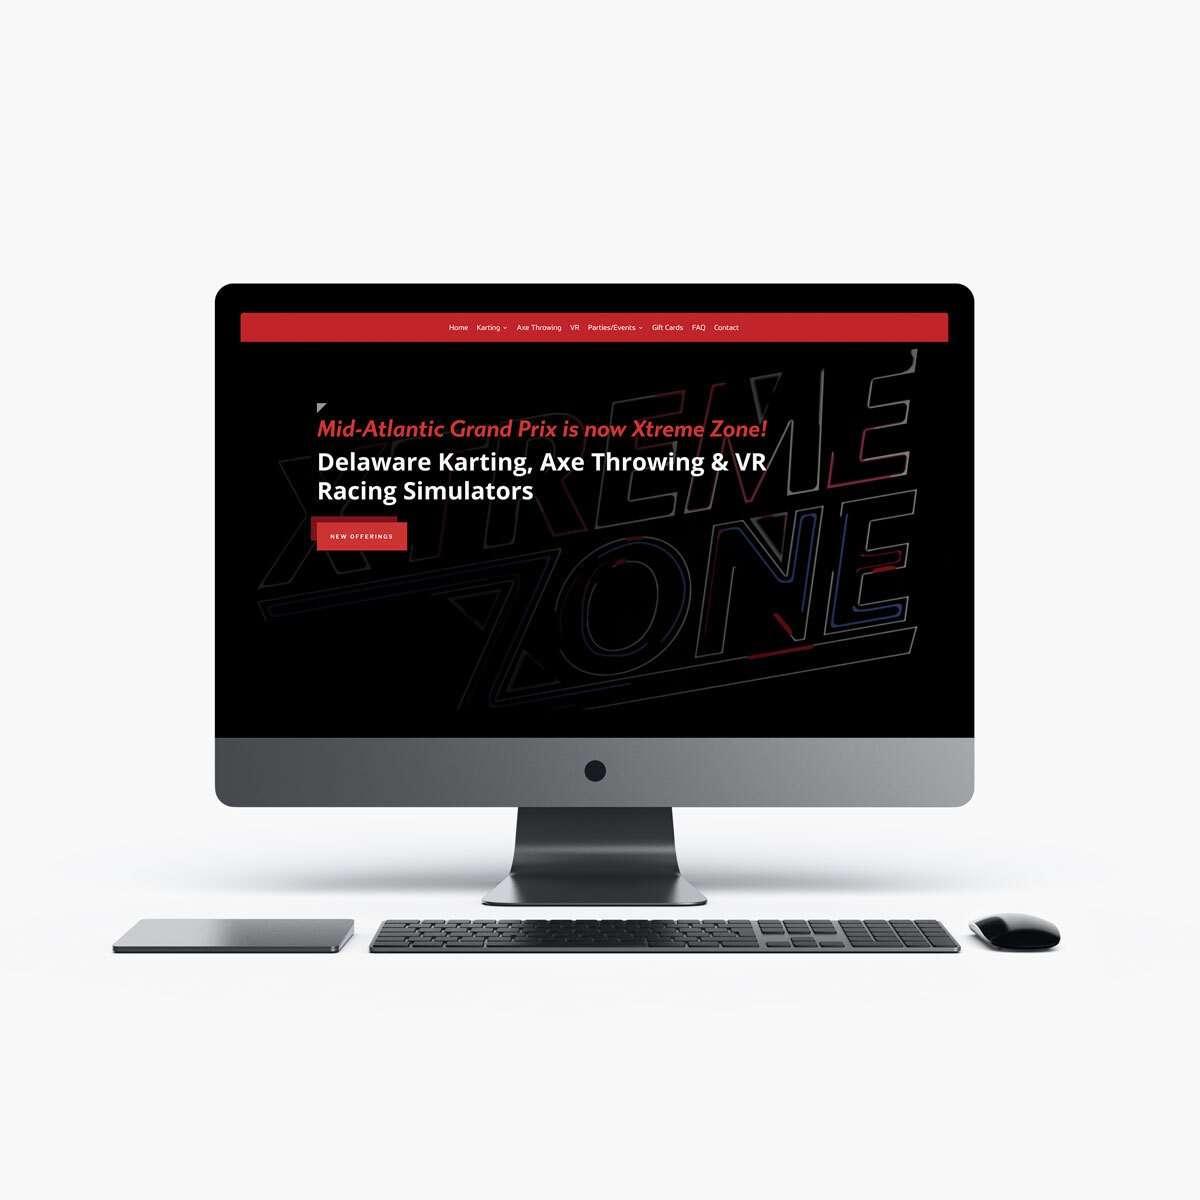 Xtreme Zone Web Design by BrandSwan, a web design company